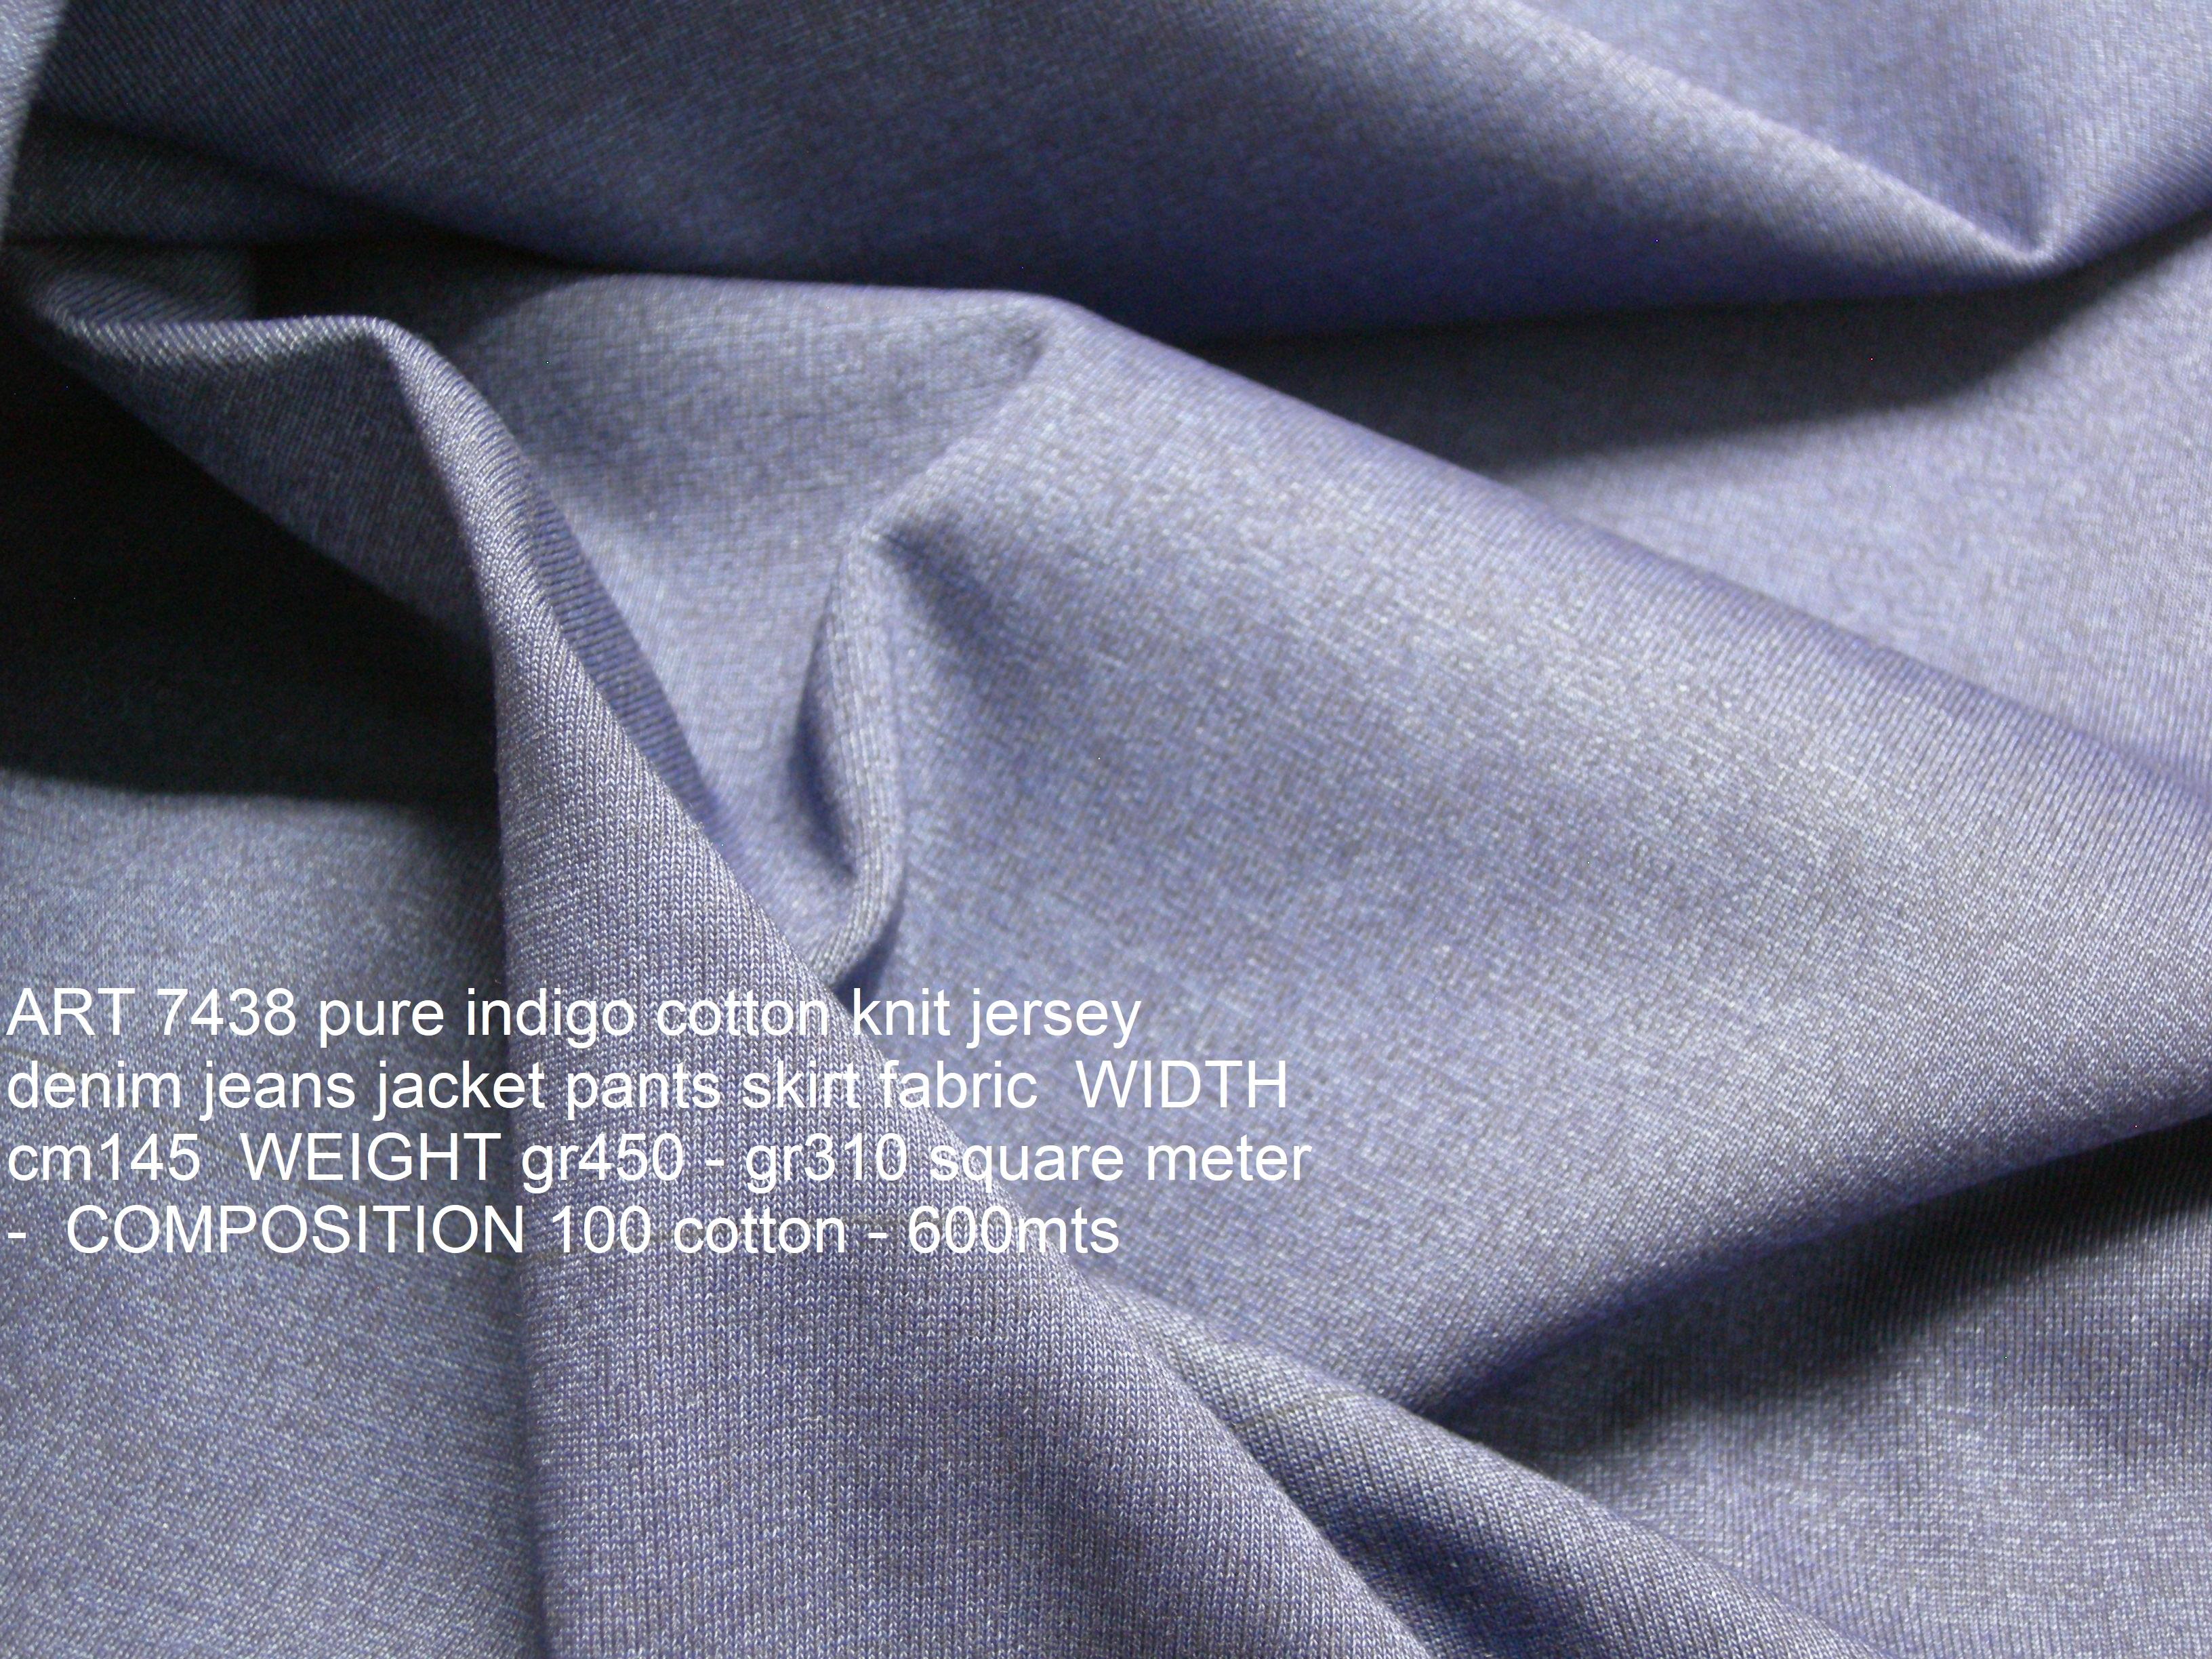 ART 7438 pure indigo cotton knit jersey denim jeans jacket pants skirt fabric WIDTH cm145 WEIGHT gr450 - gr310 square meter - COMPOSITION 100 cotton - 600mts